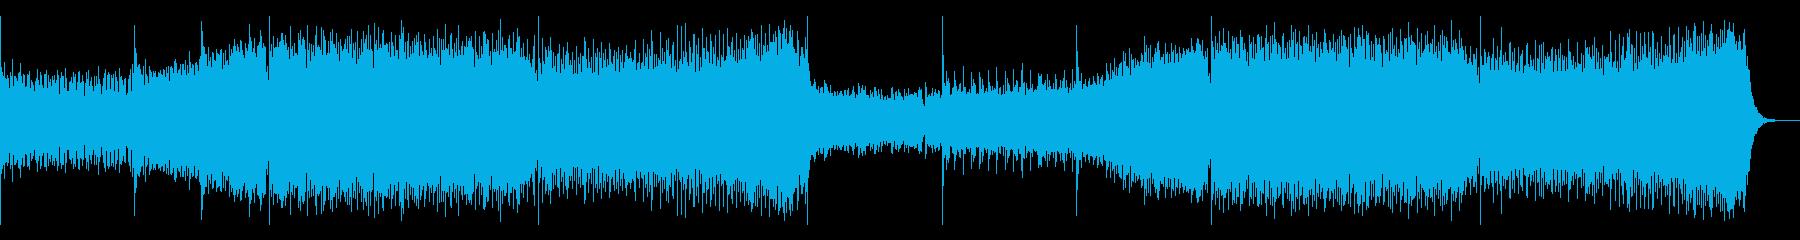 EDM・ノリが良い・明るい・元気・爽やかの再生済みの波形